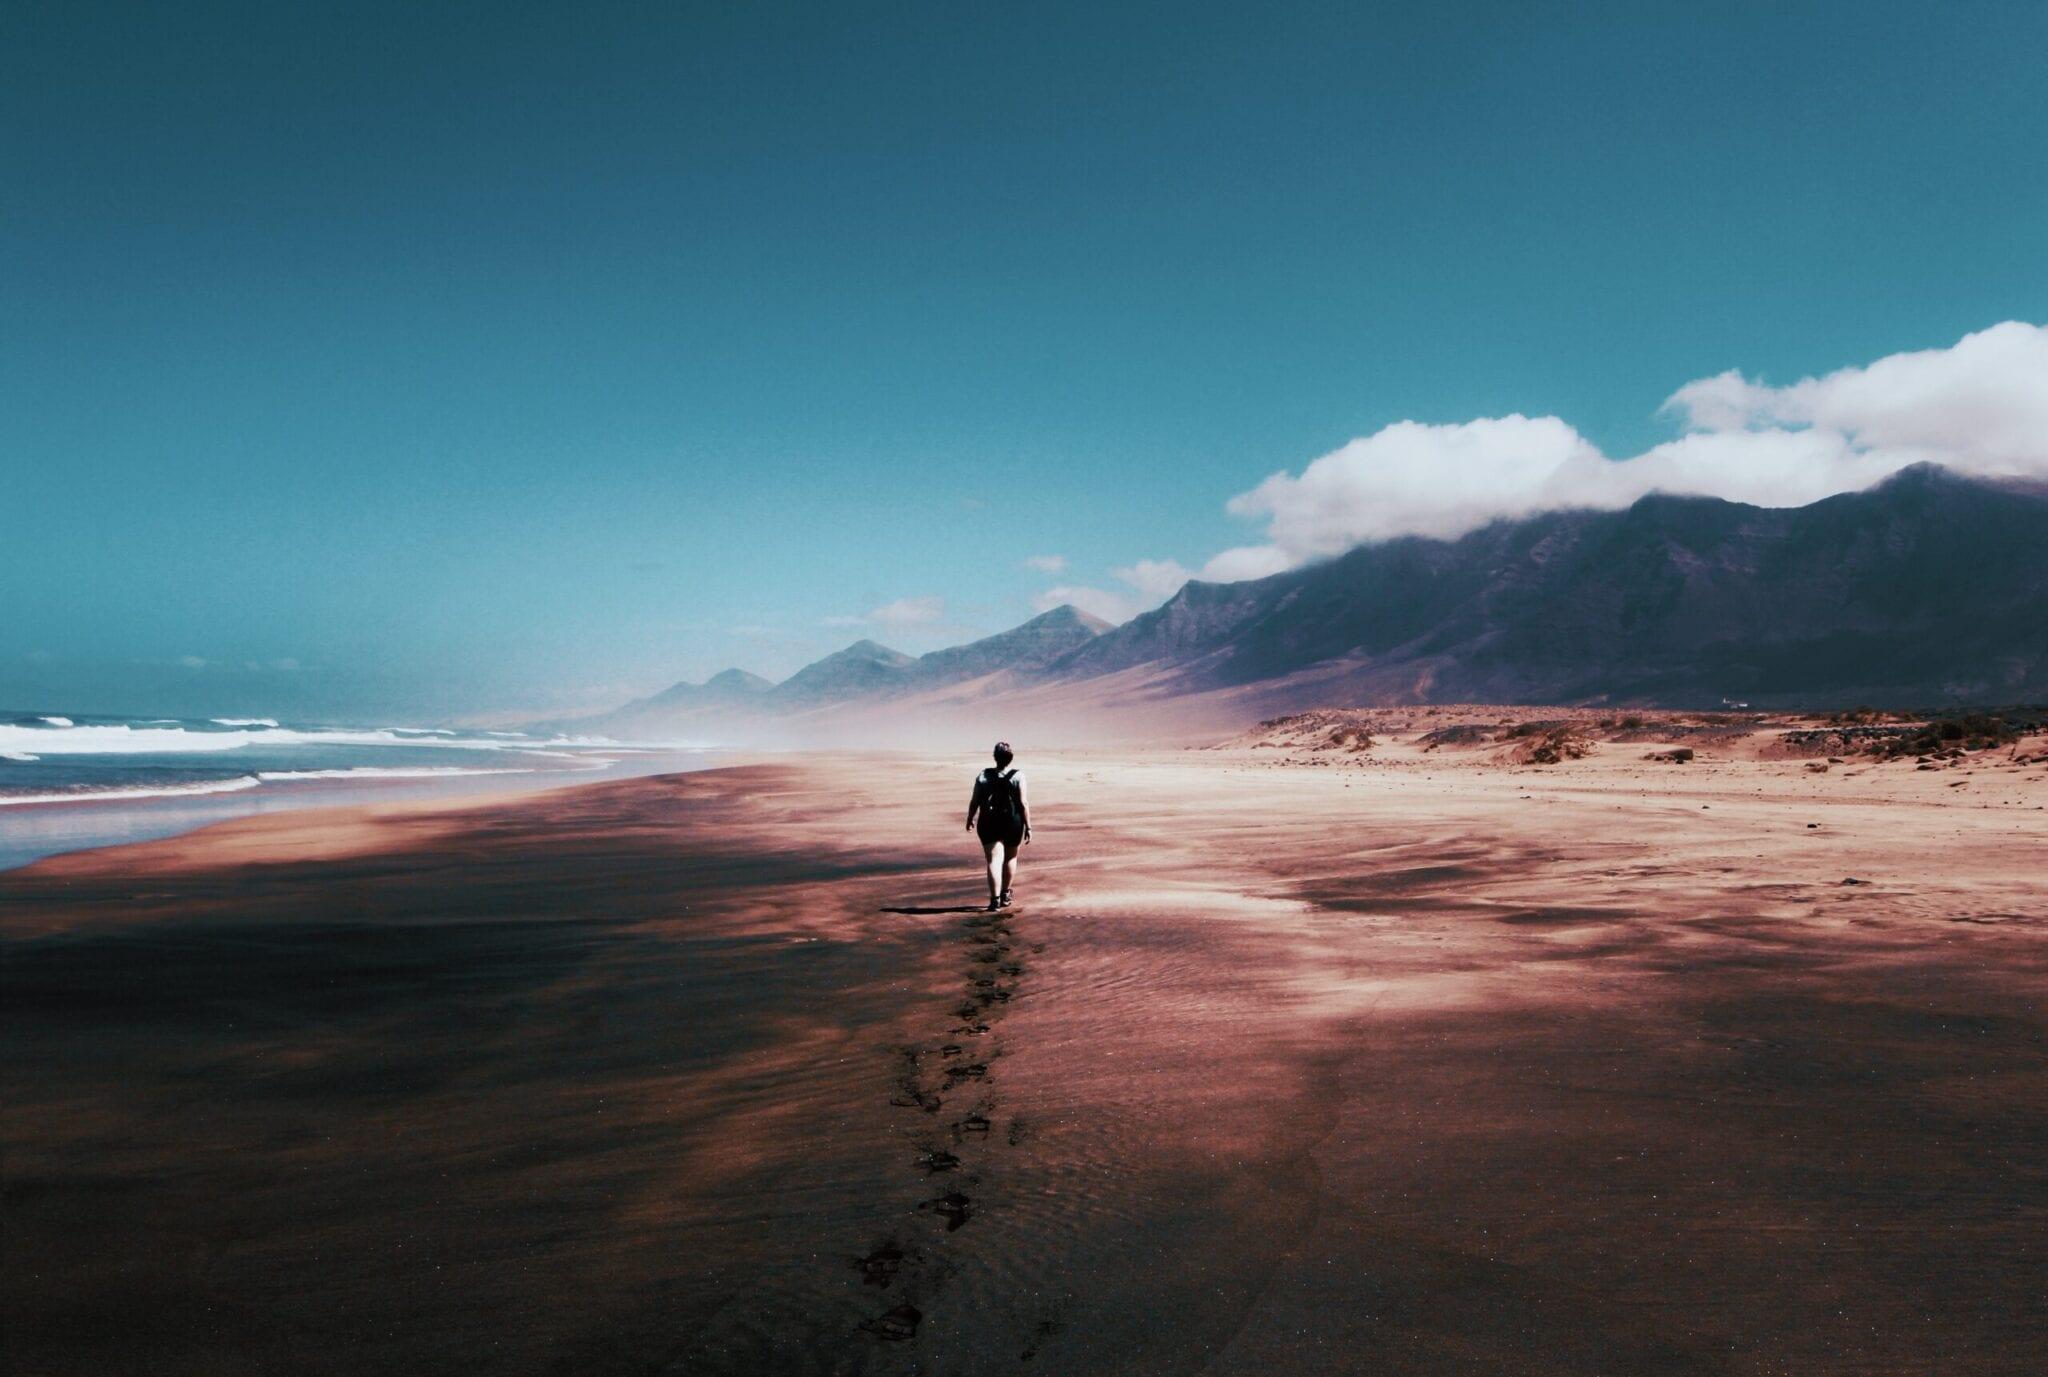 Spaziergang durch den Sand